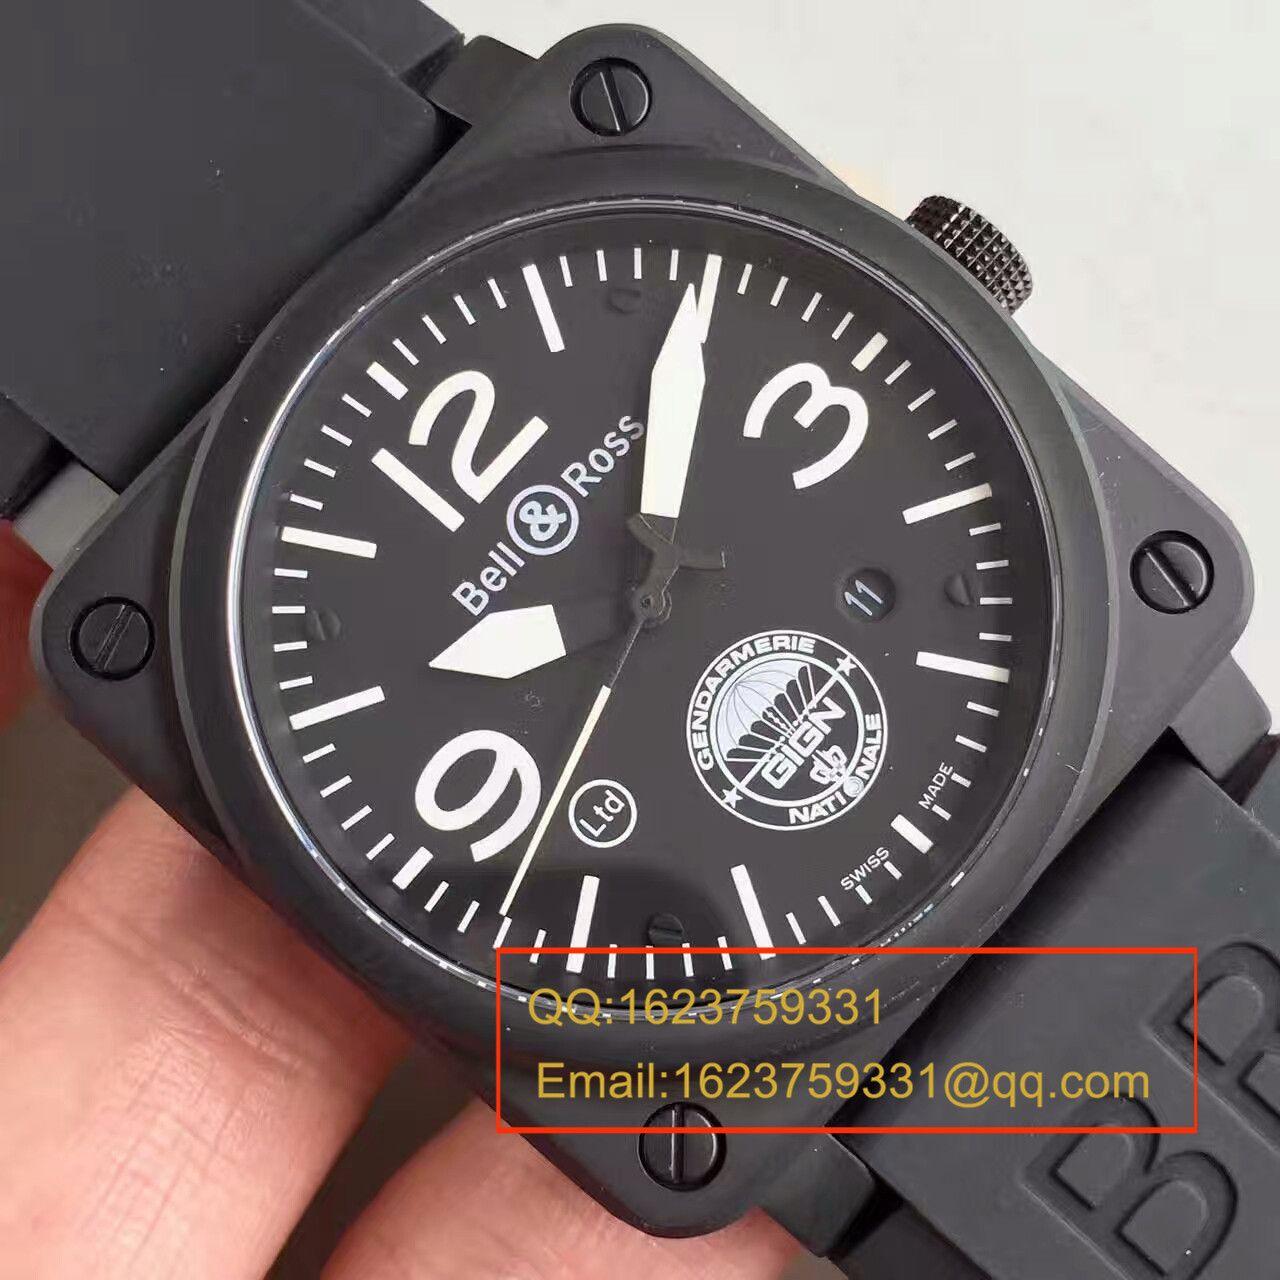 【BR一比一高仿手表】柏莱仕法国国家宪兵特勤队设计制造GIGN 专属特别版腕表 BR03-92 / BL012